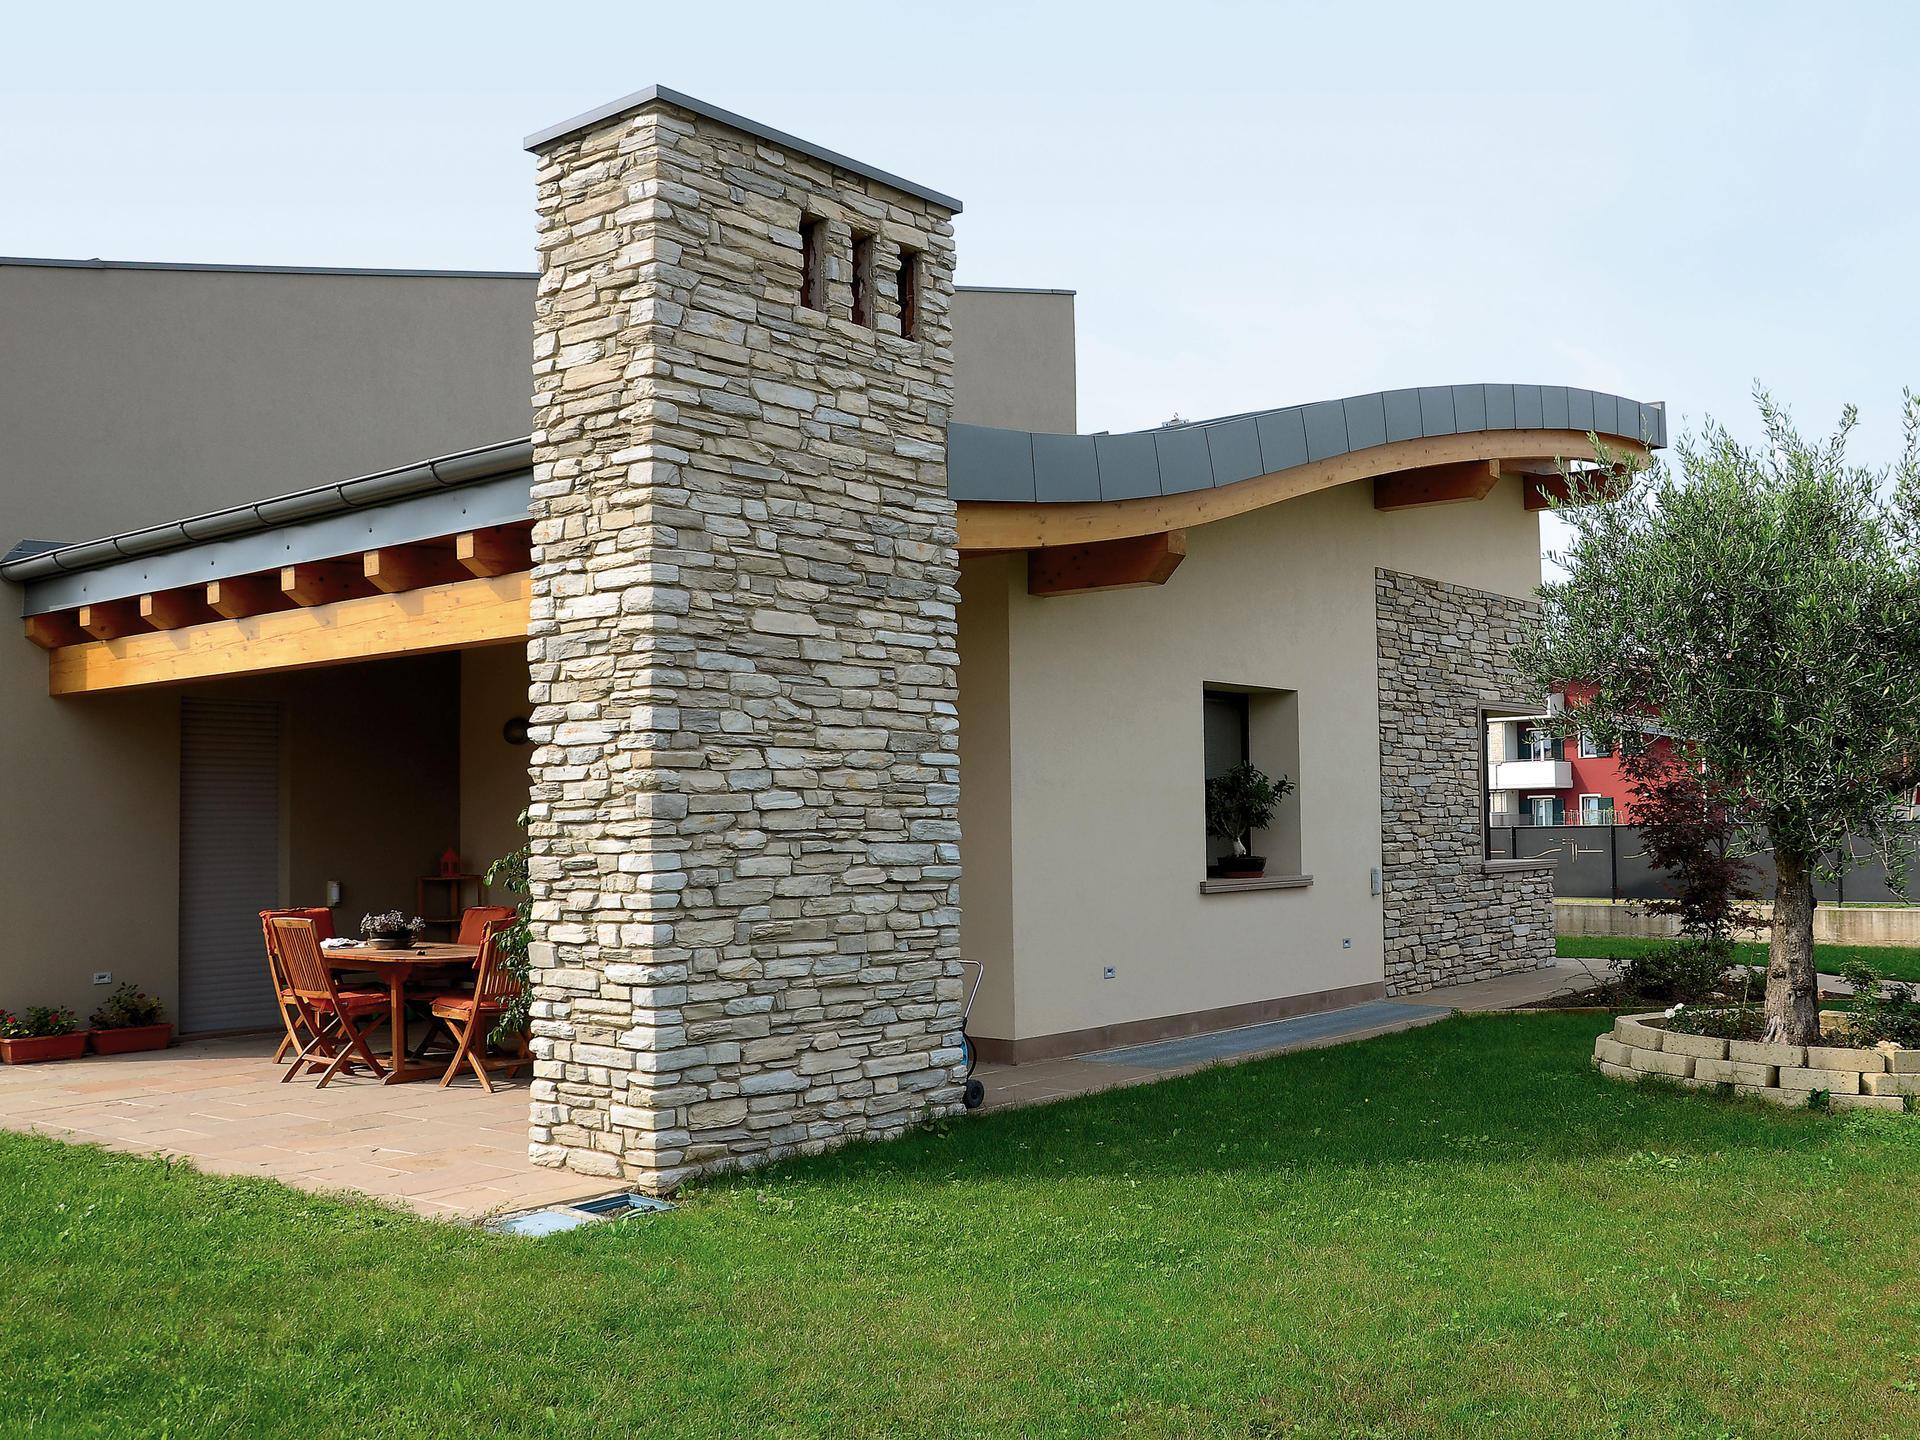 Rivestimento Esterno In Pietra Ricostruita : Edilizia casa rivestimenti in pietra ricostruita